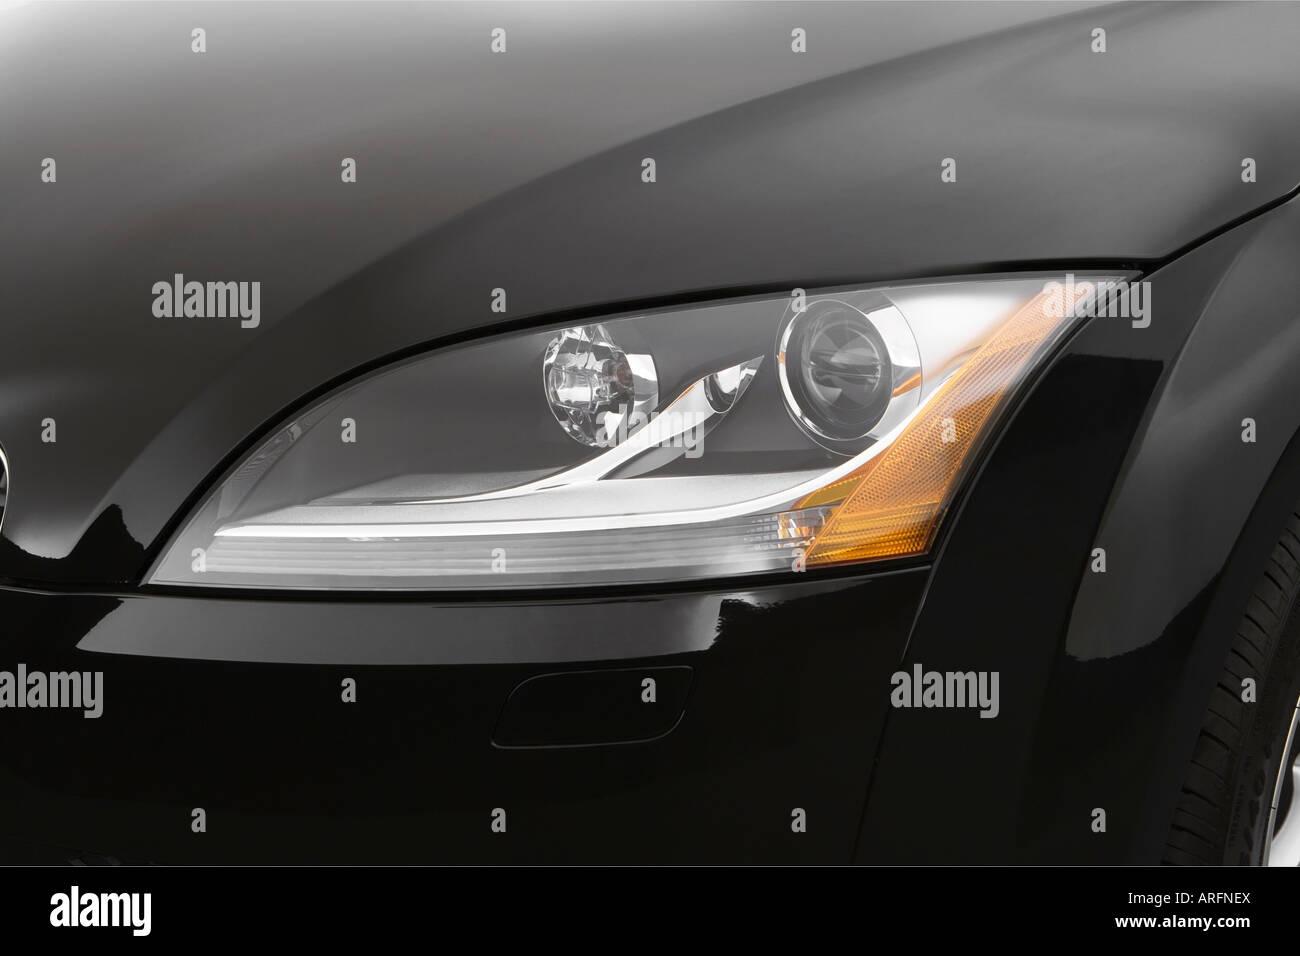 2008 audi tt 2.0t in black - headlight stock photo, royalty free